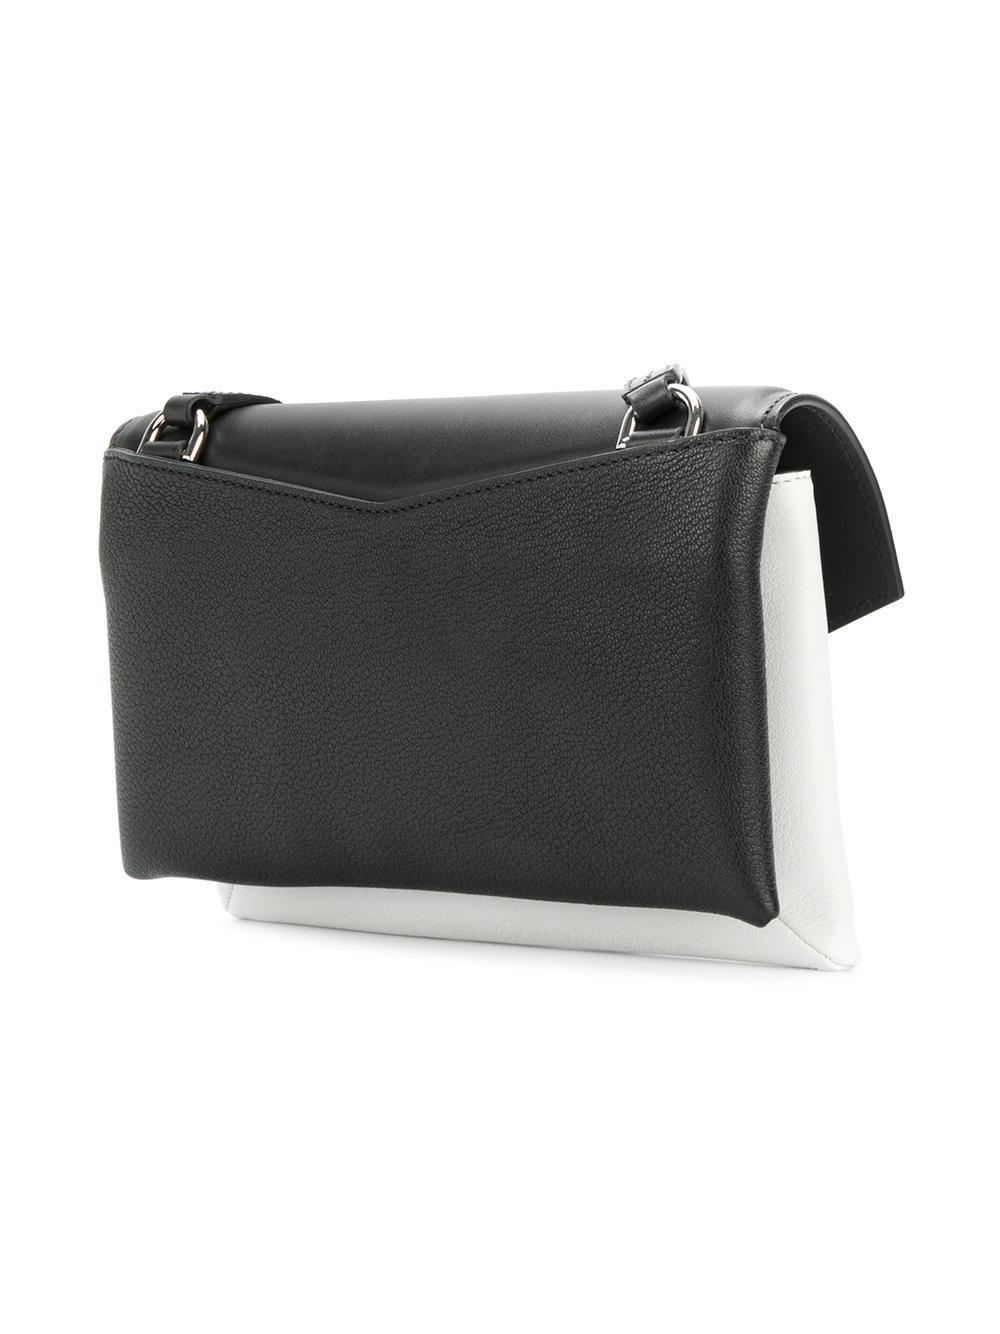 Givenchy Duetto Crossbody Bag in Black - Lyst b67f3d04f217f